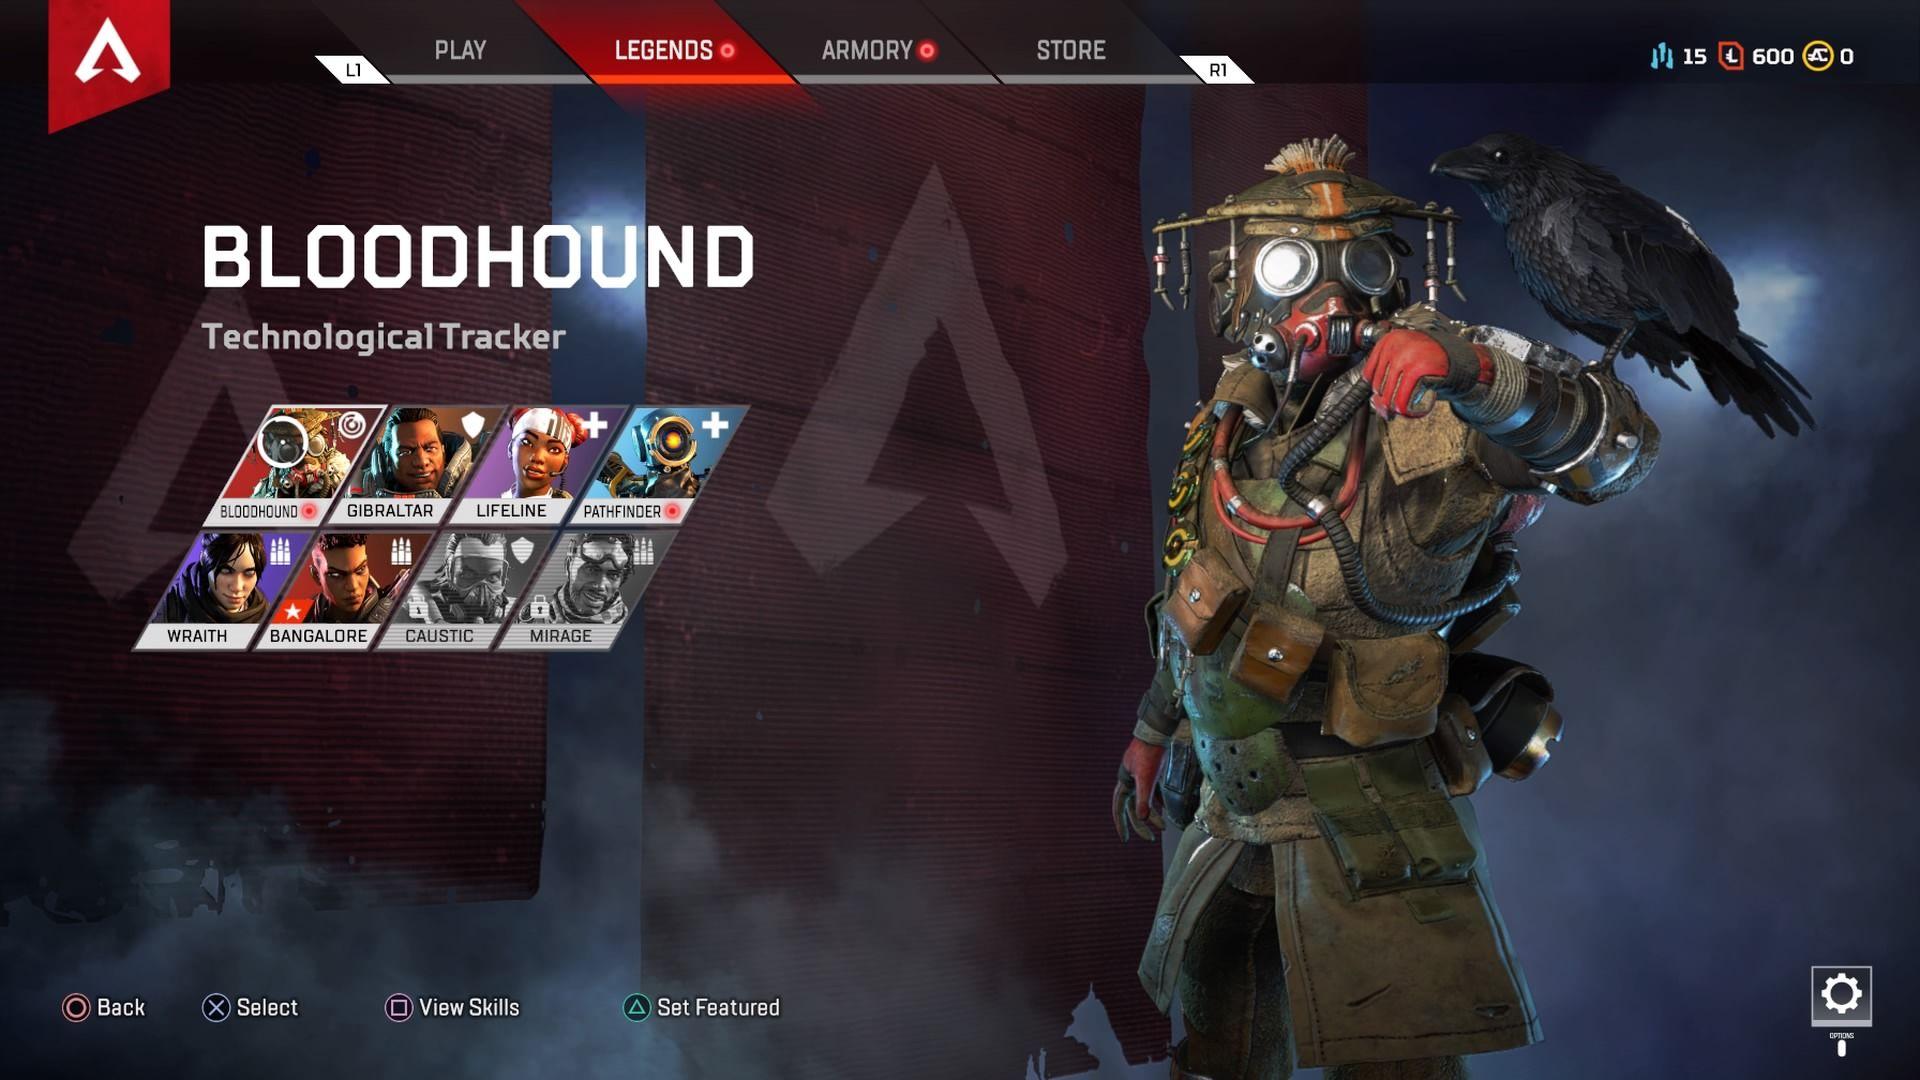 Legends Character Tier List Ranking – Icalliance